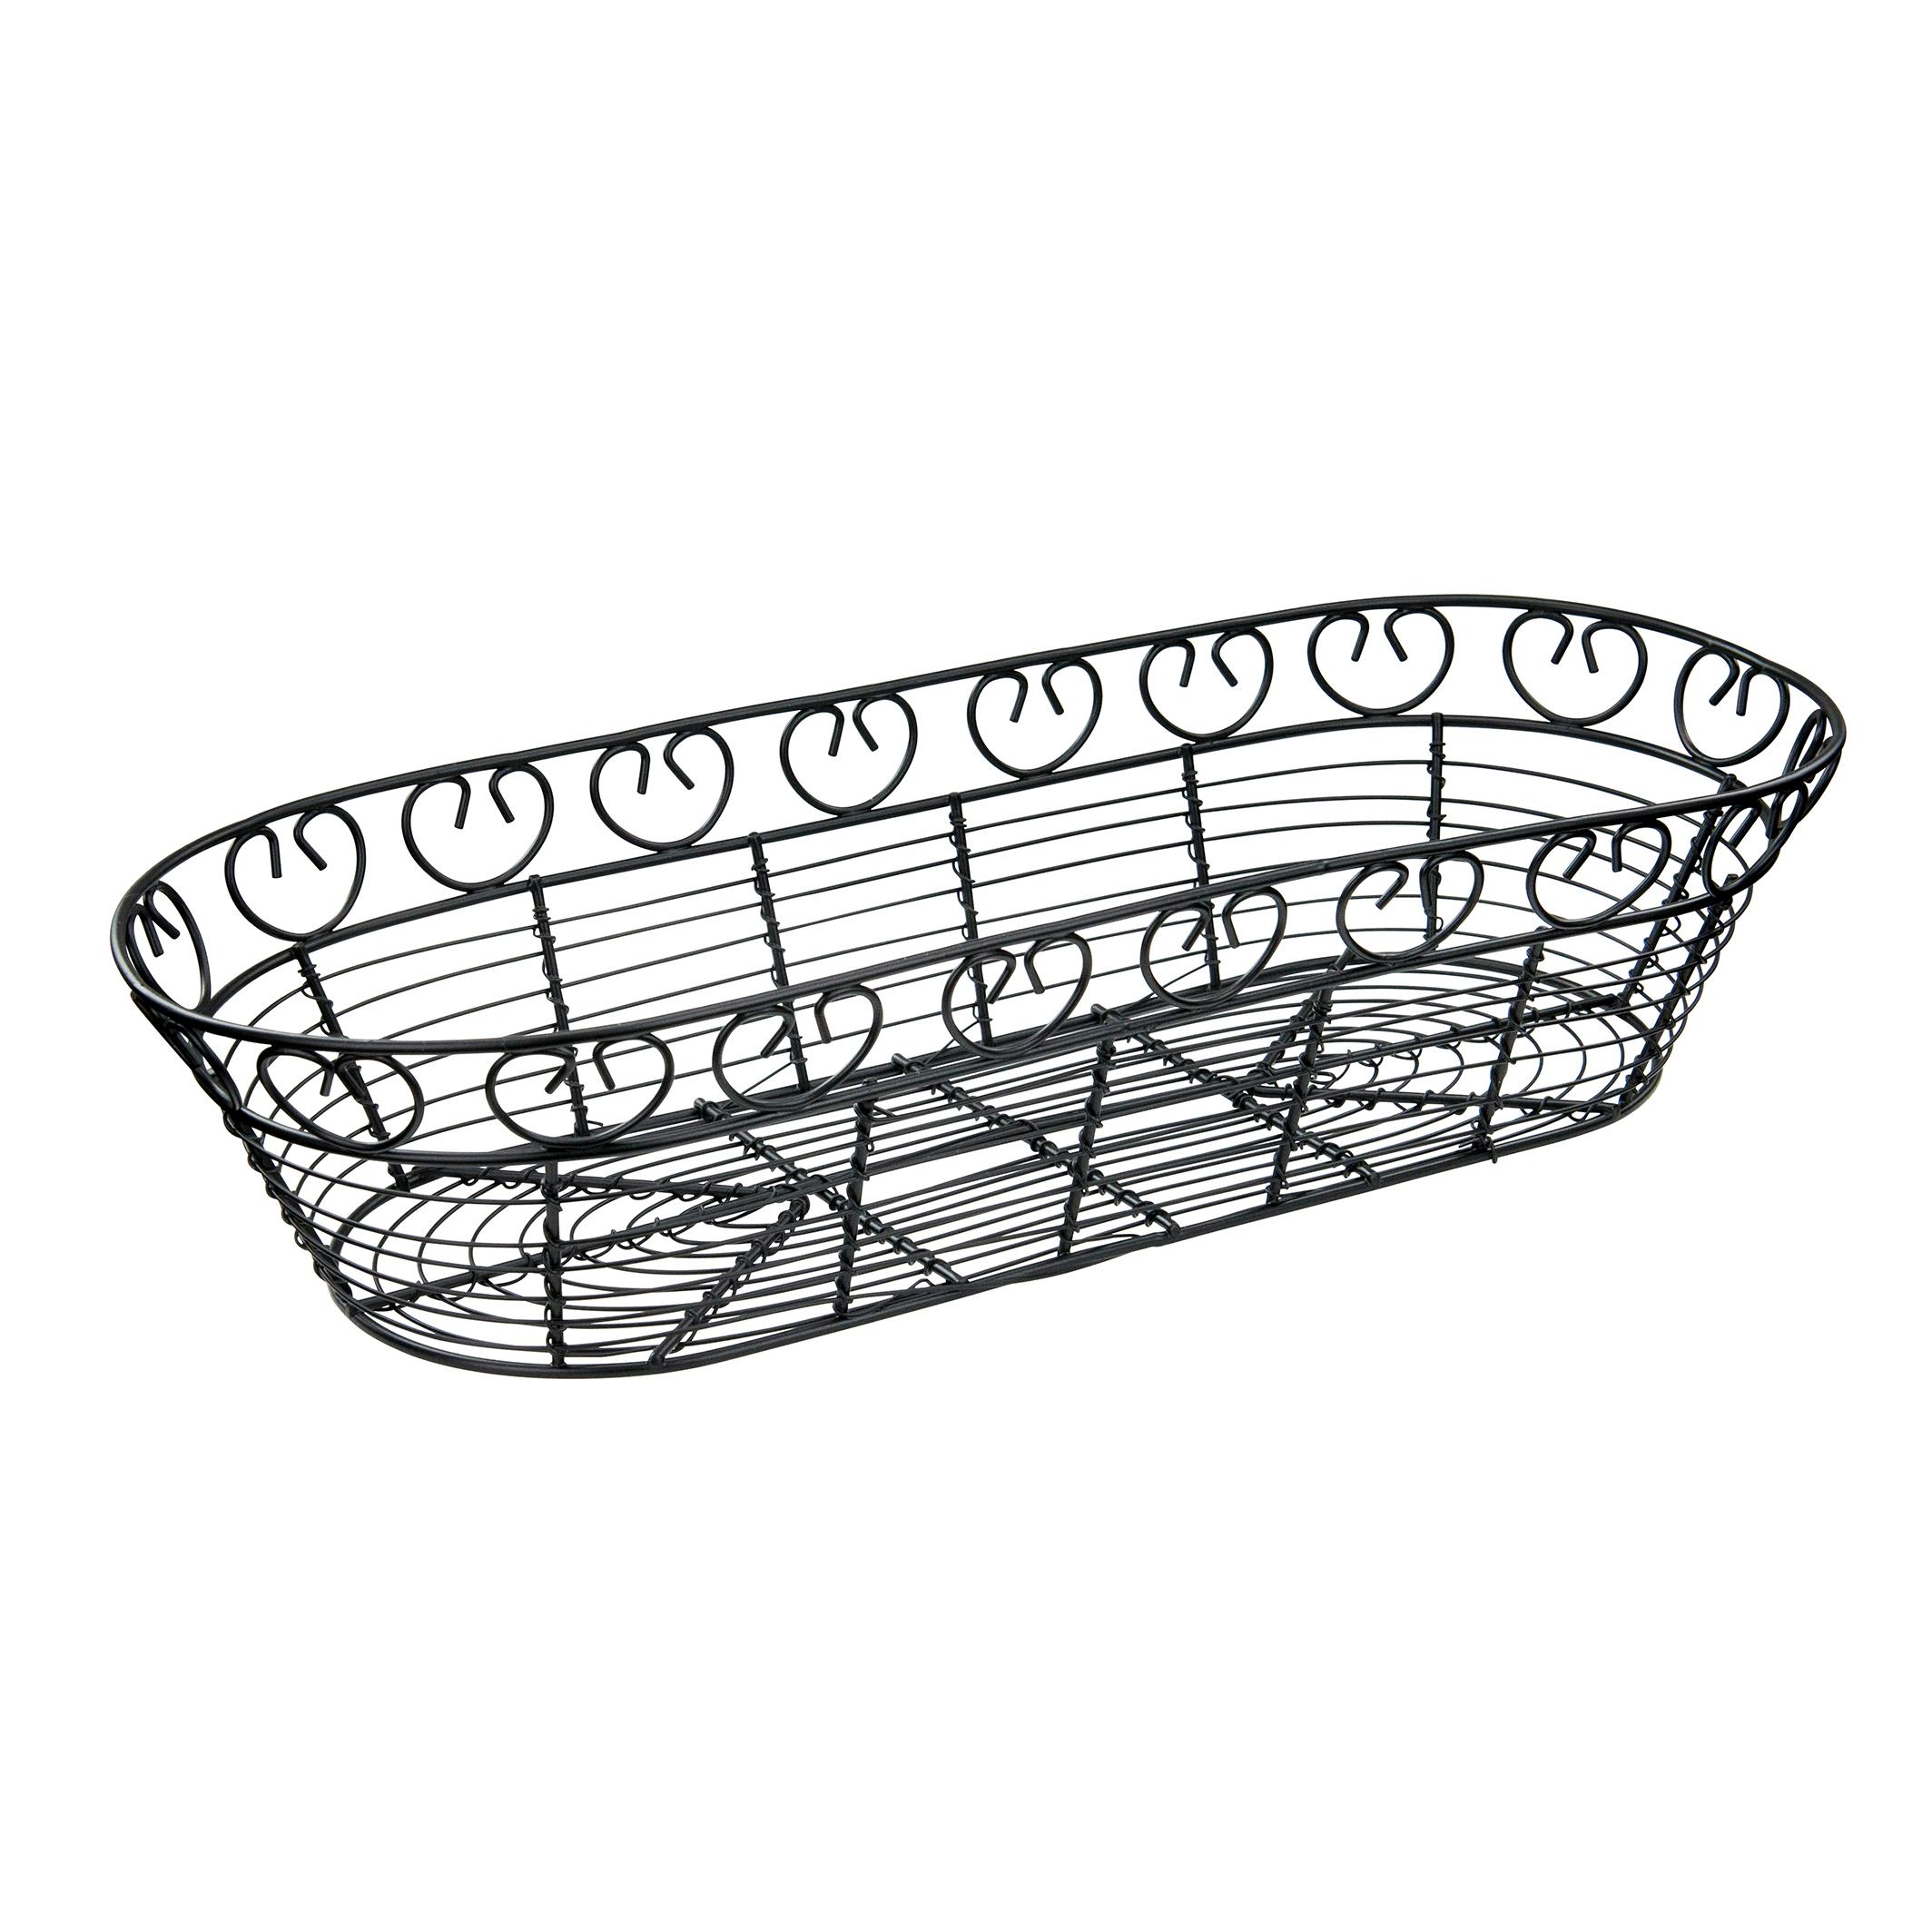 Winco WBKG-15 basket, tabletop, metal